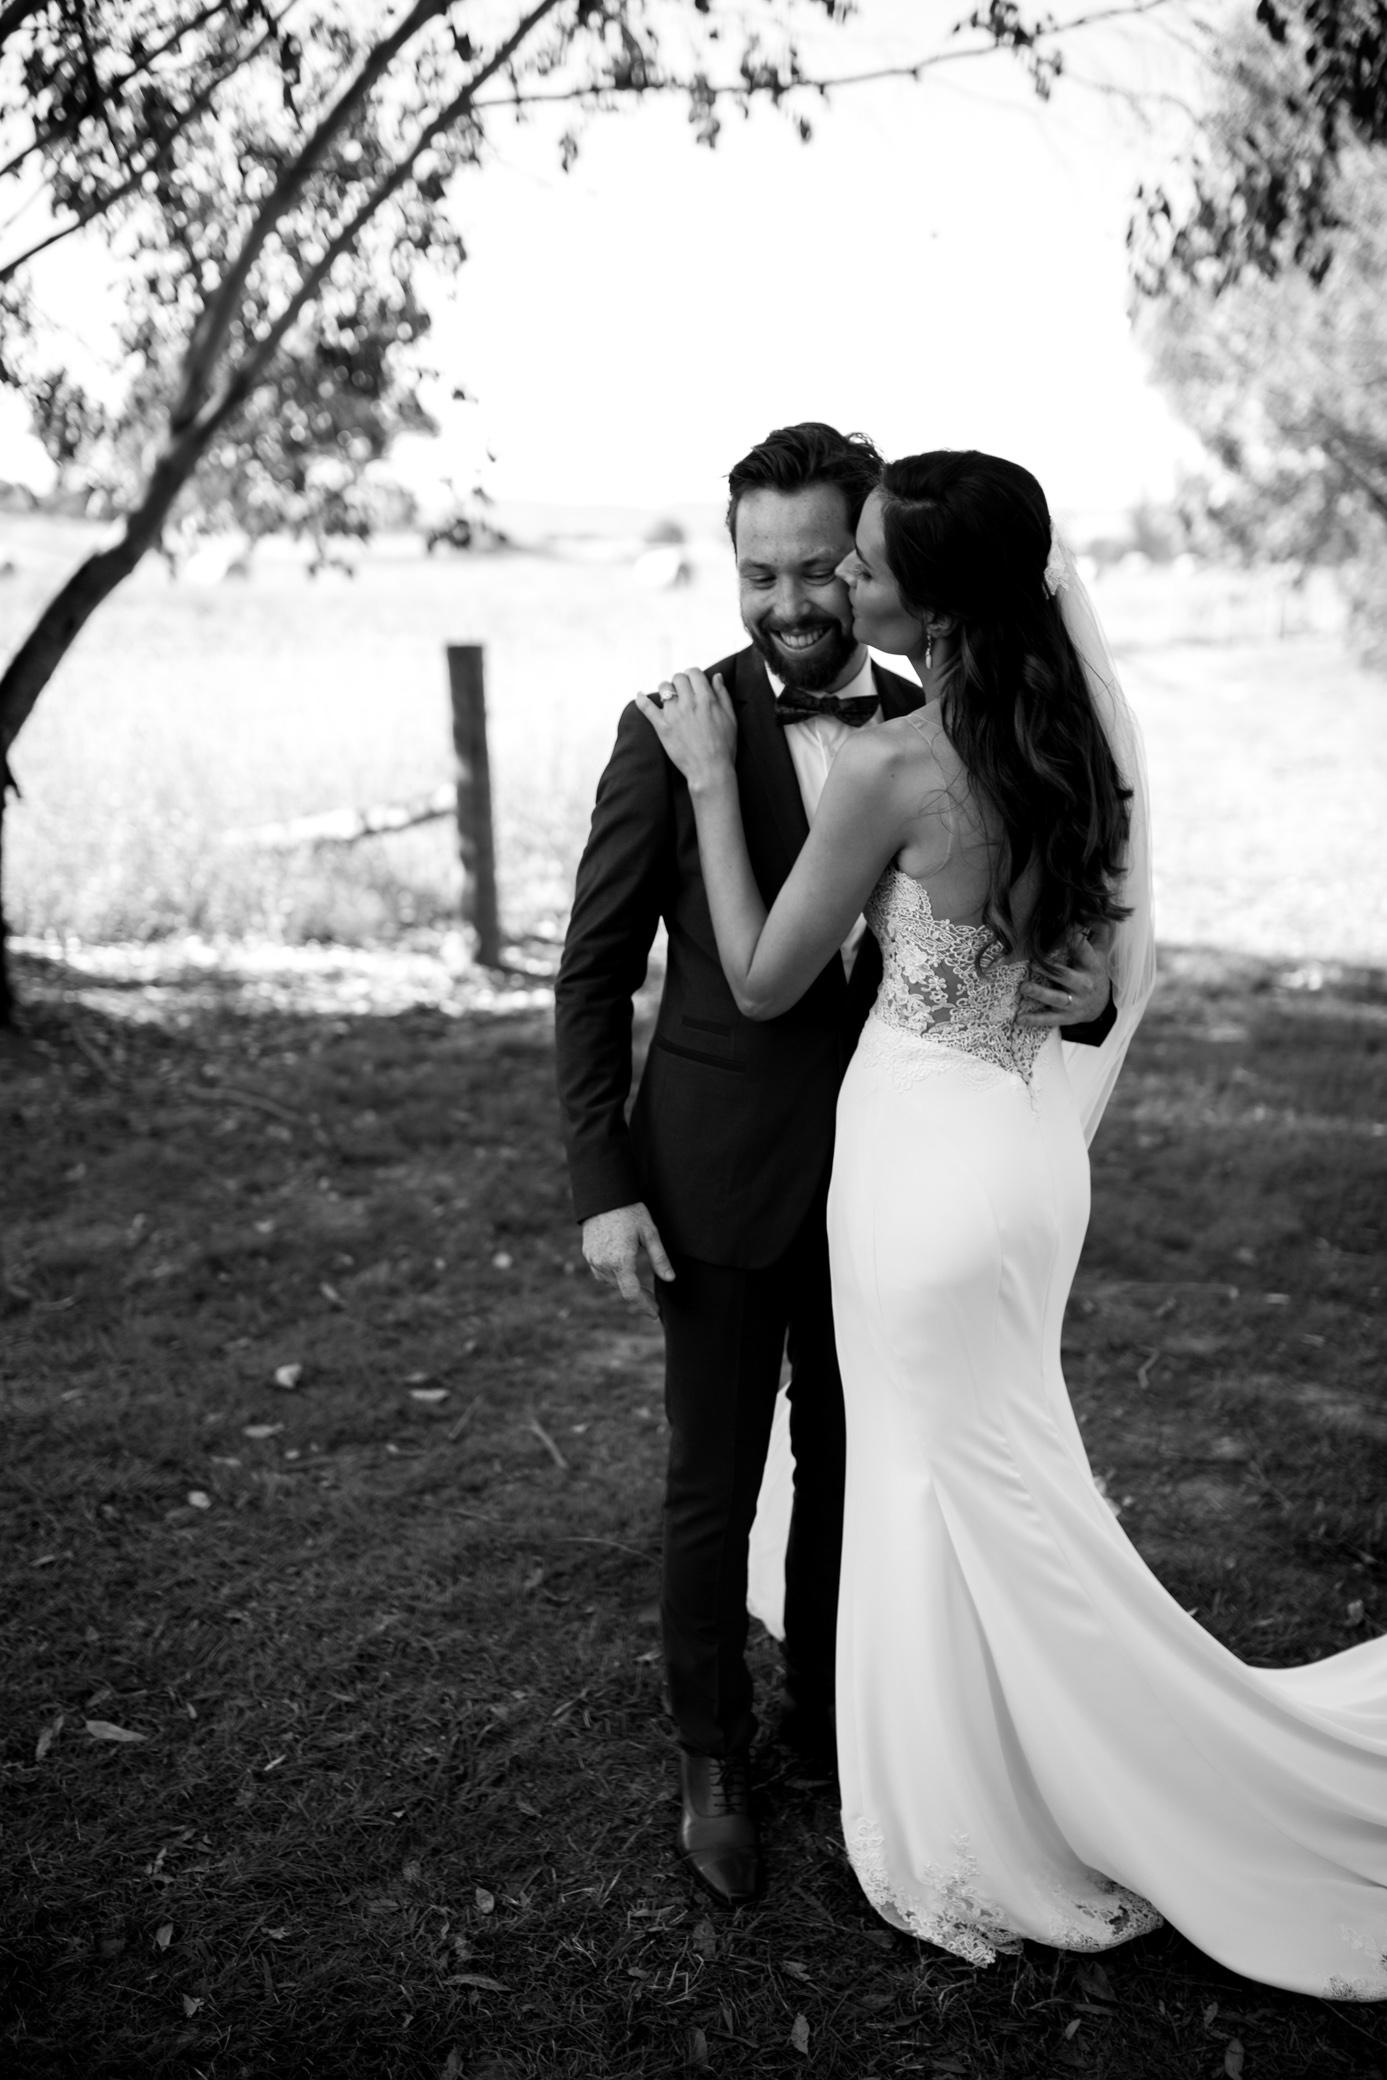 mr-theodore_white-vine-photography_same-sex-wedding-directory4.jpg